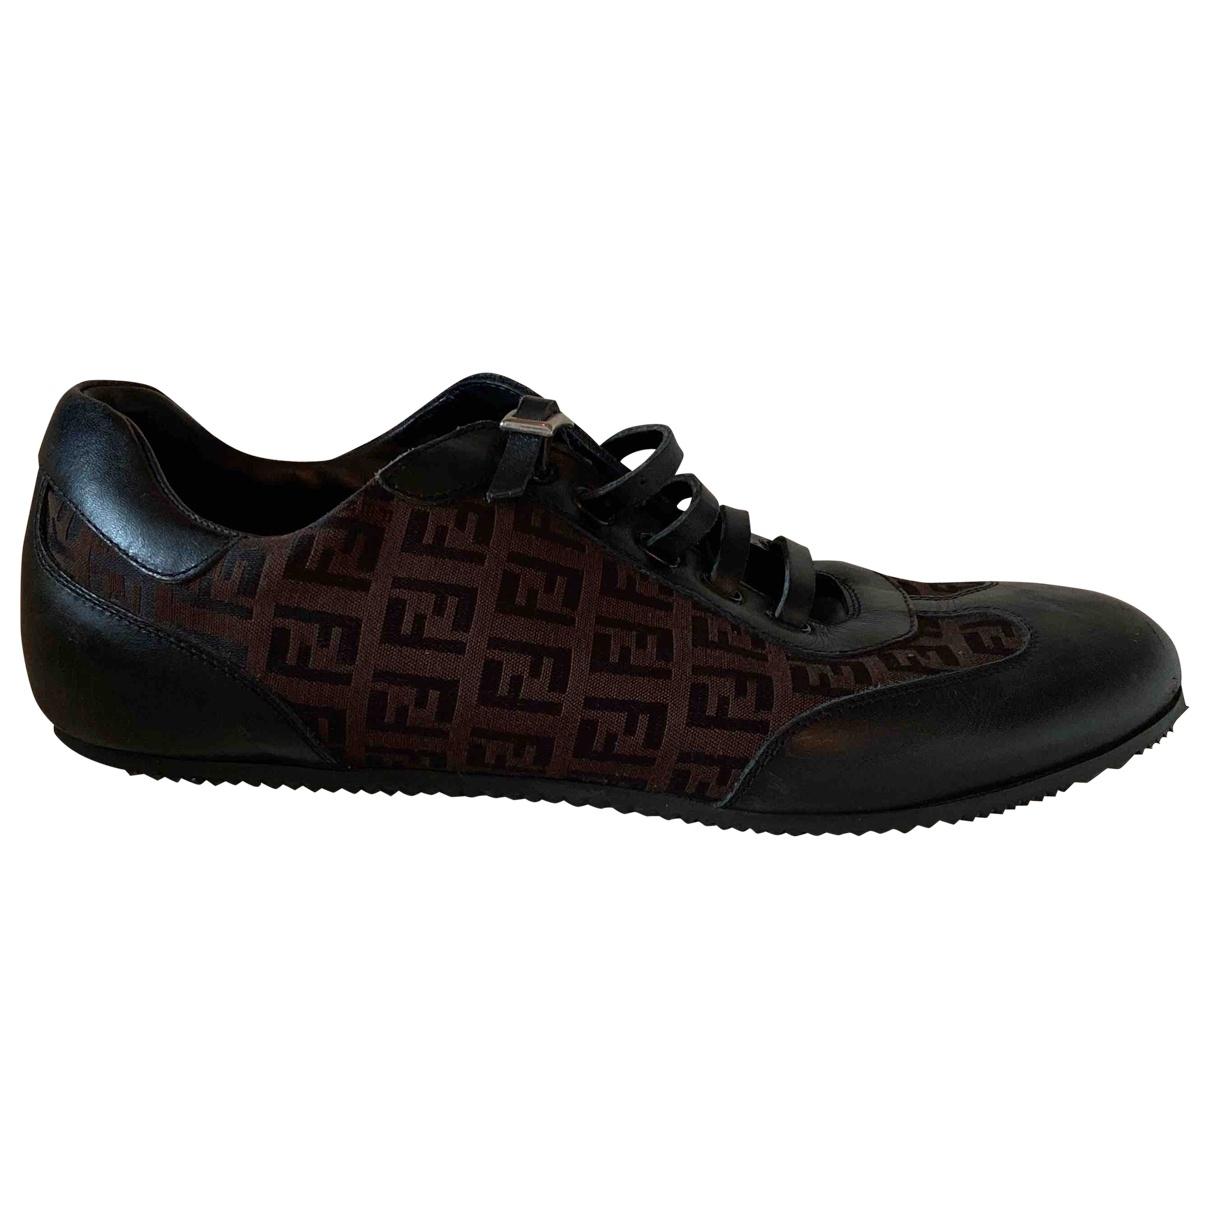 Fendi FendiMania Sneakers in  Braun Leder